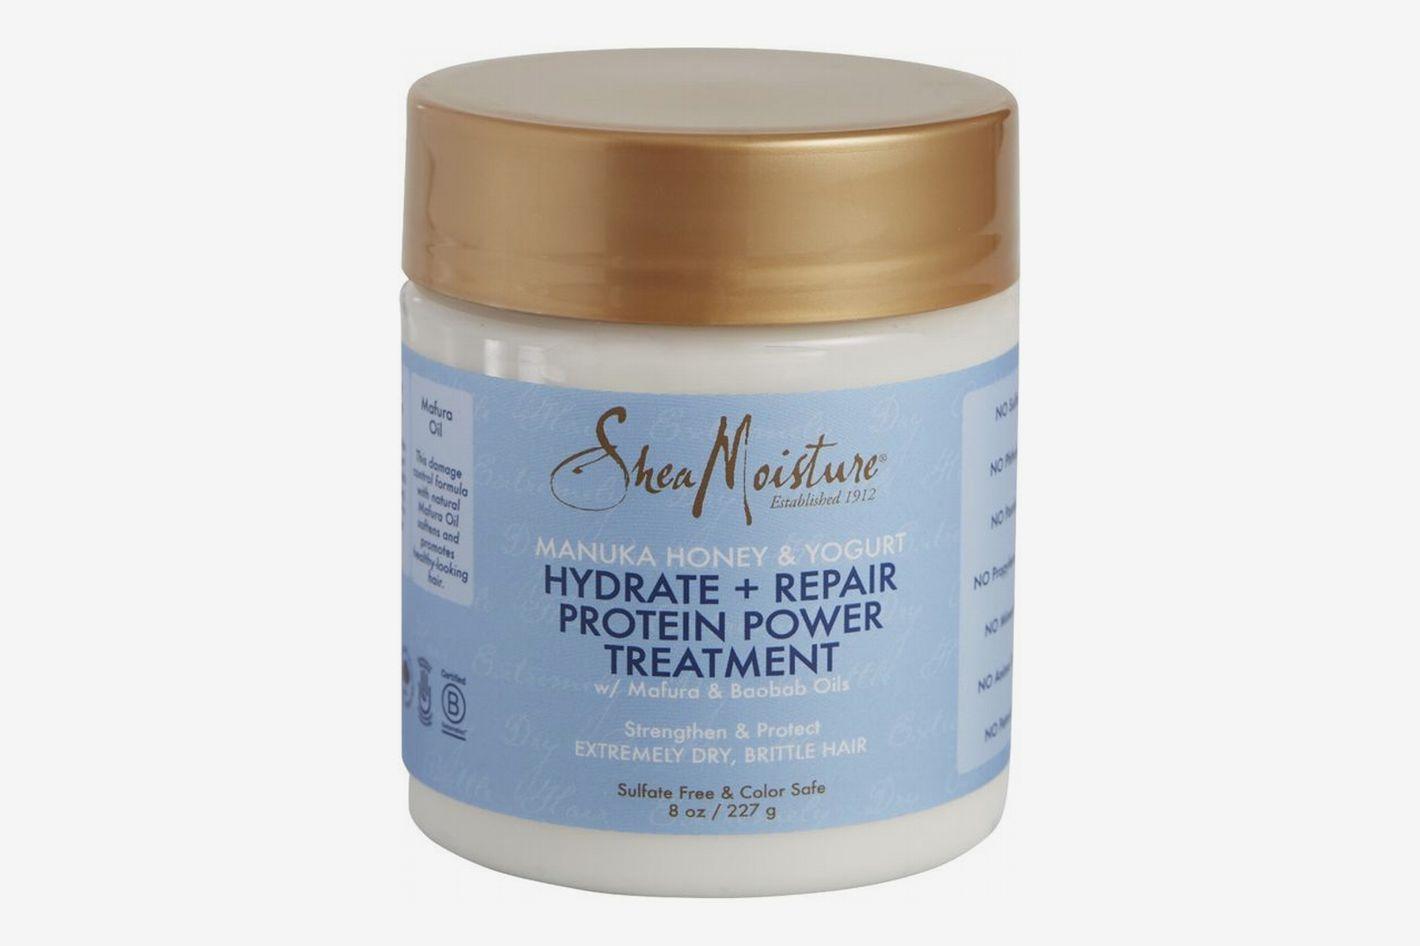 SheaMoisture Manuka Honey & Yogurt Hydrate and Repair Protein Strong Treatment